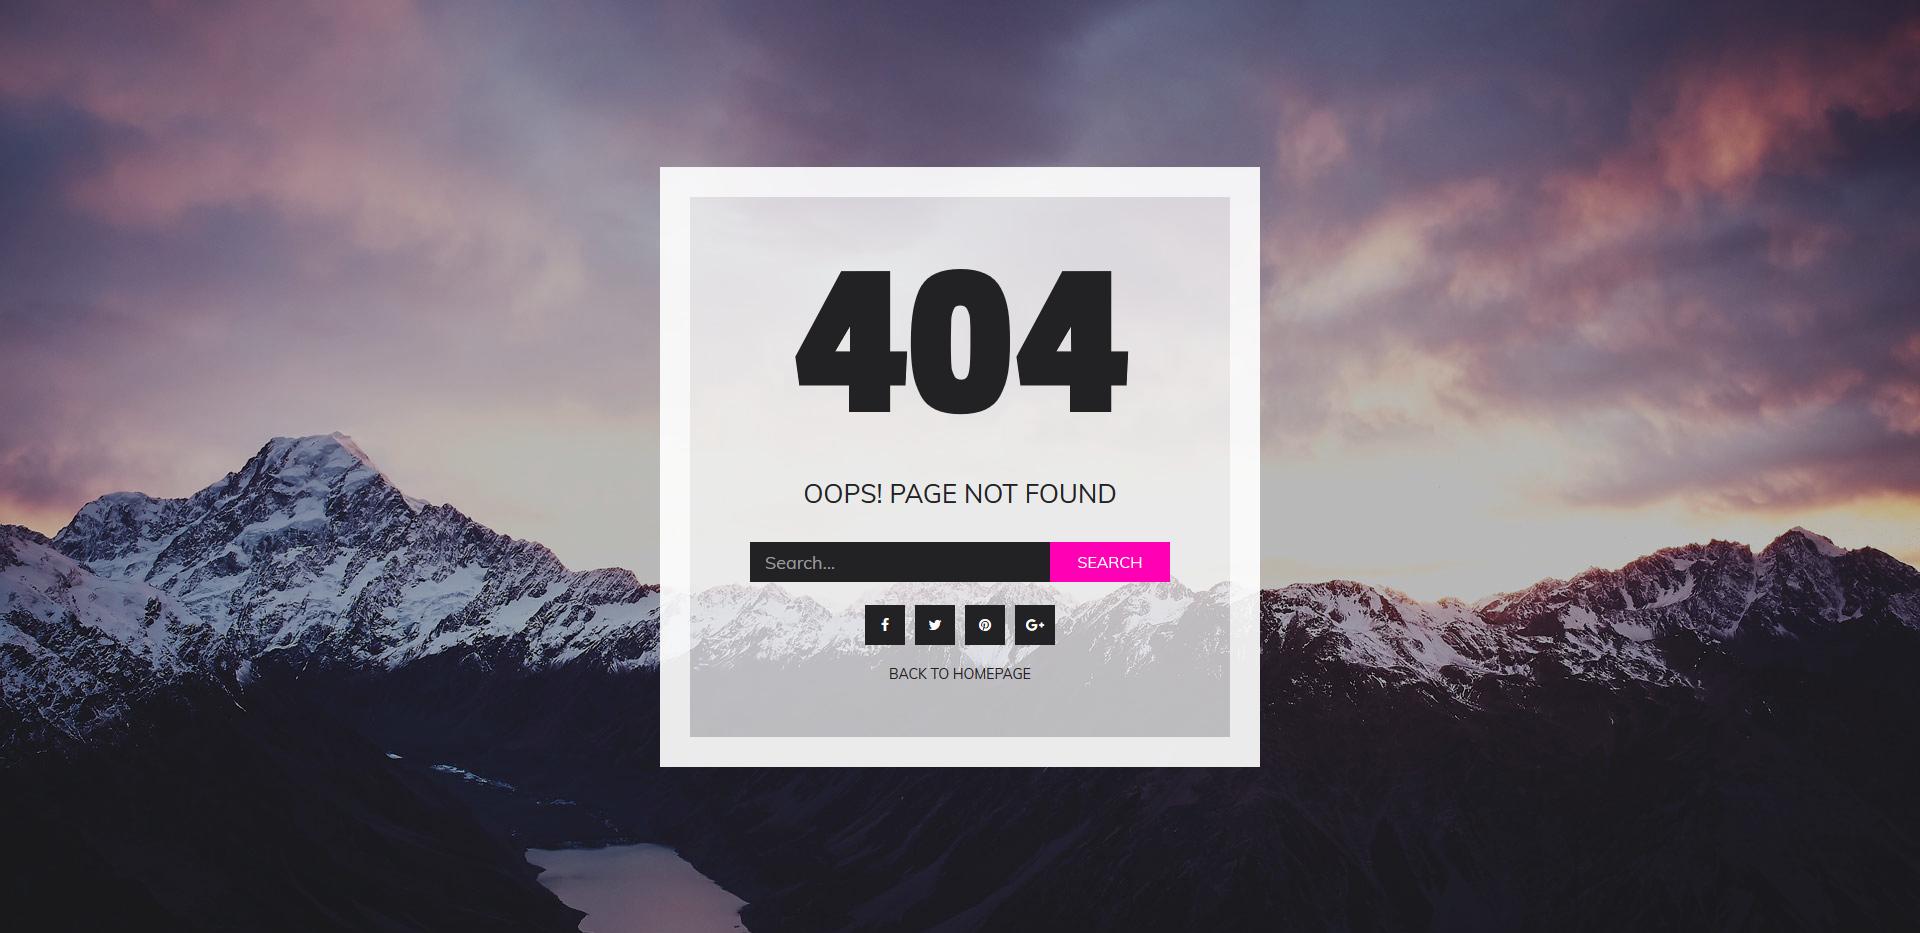 Kinox.To Fehler 404